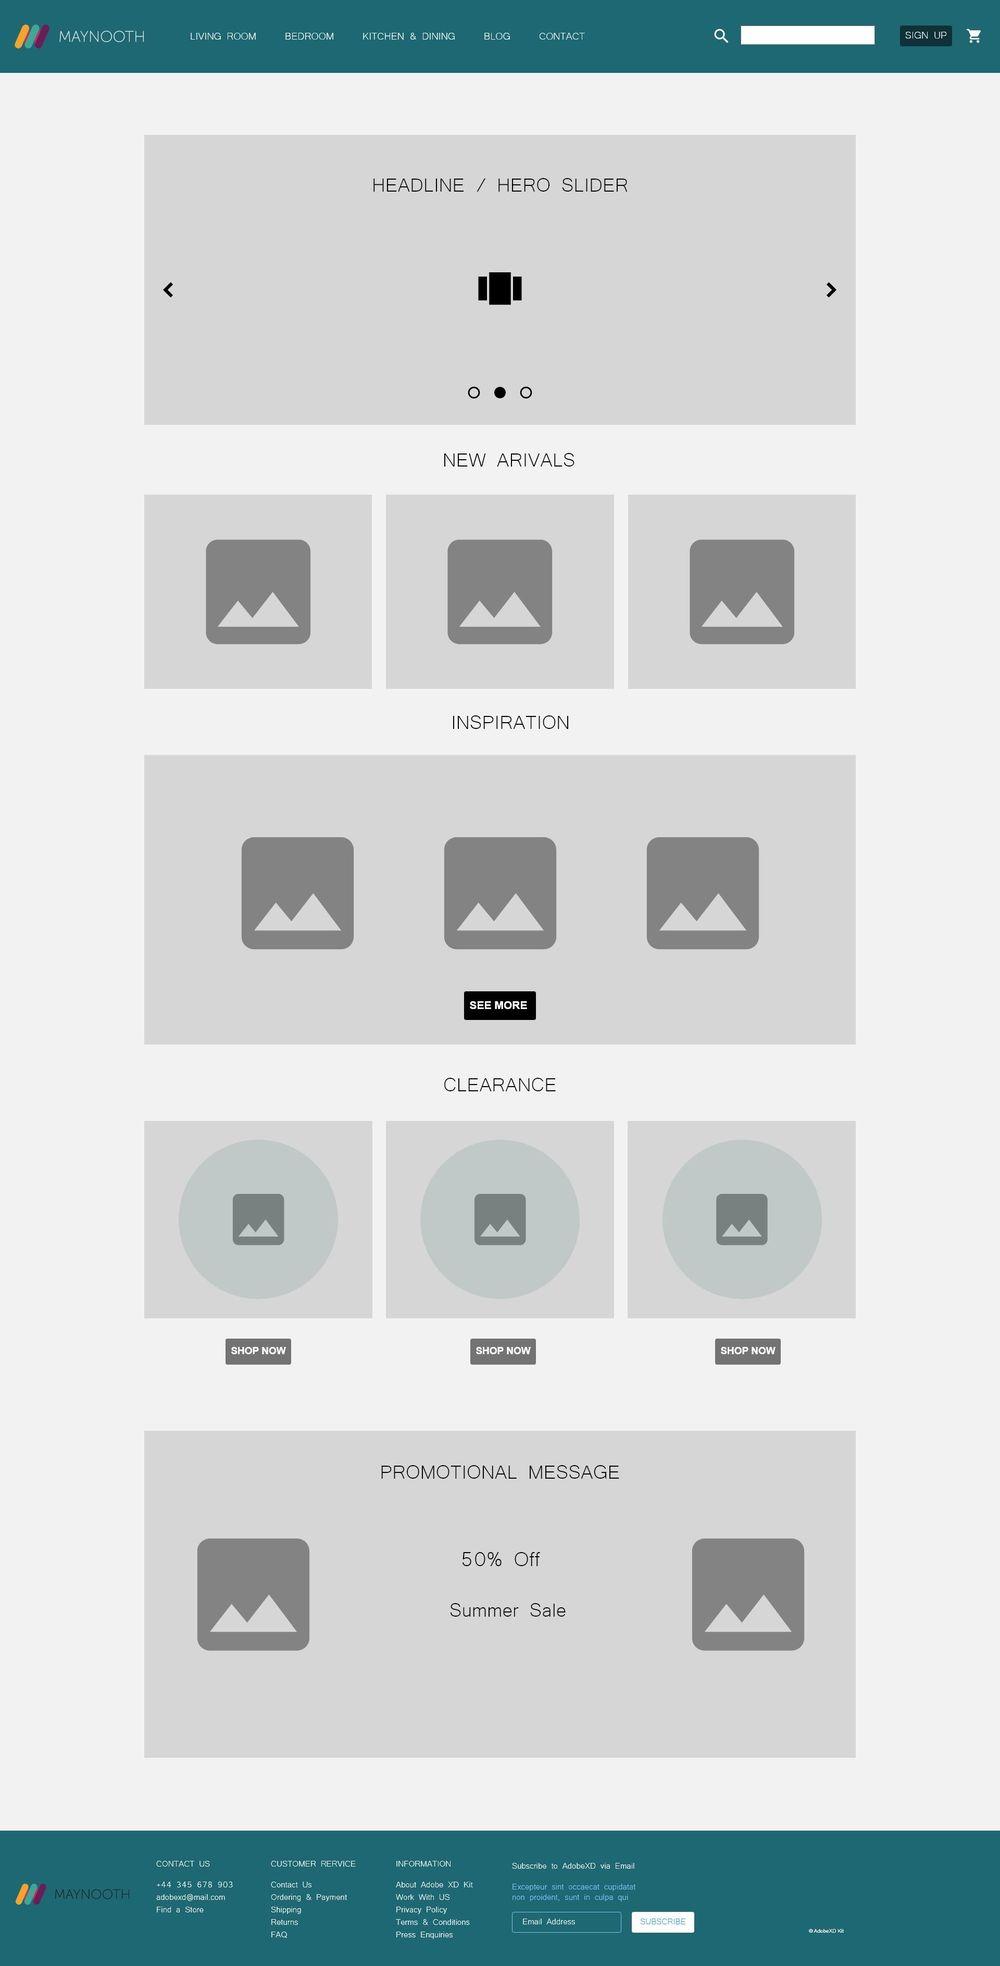 UI UX Design - image 1 - student project